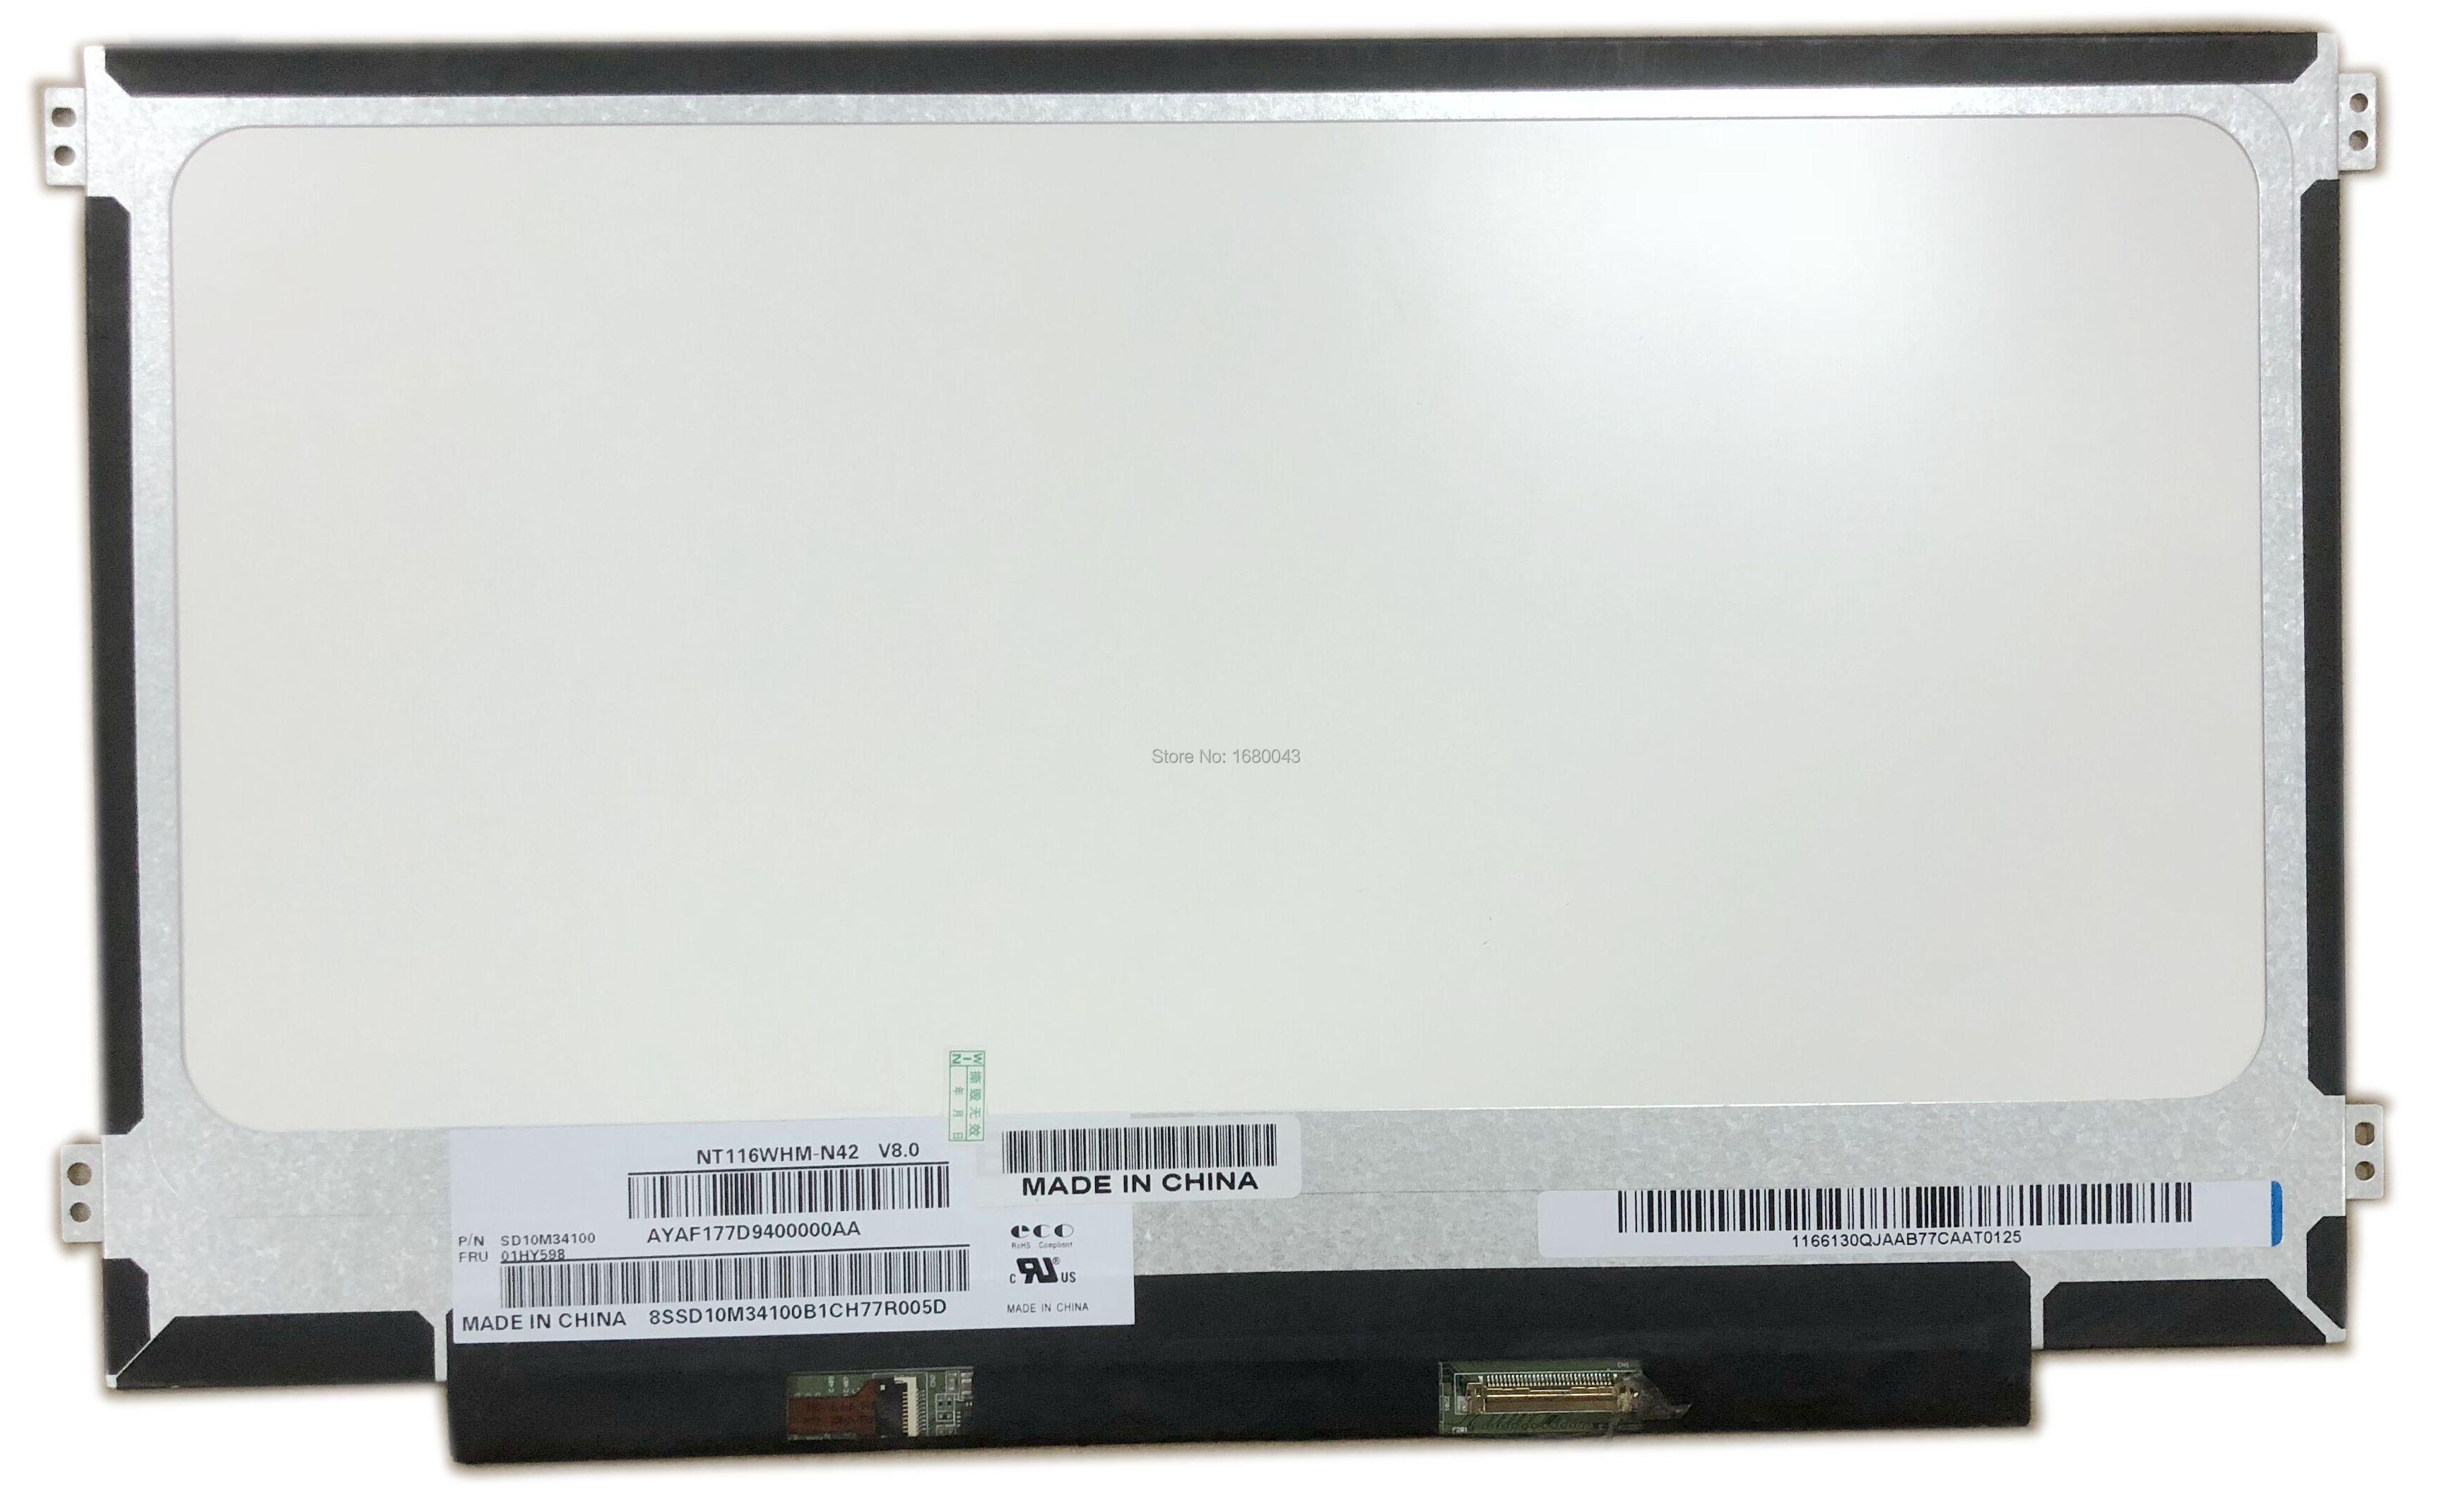 NT116WHM-N42 N12 صالح B116XTN02.3 B116XTN02.1 N116BGE-EA1 N116BGE-EB2 N116BGE-EA2 M116NWR1 R7 LED LCD شاشة لوحة 30PIN eDP